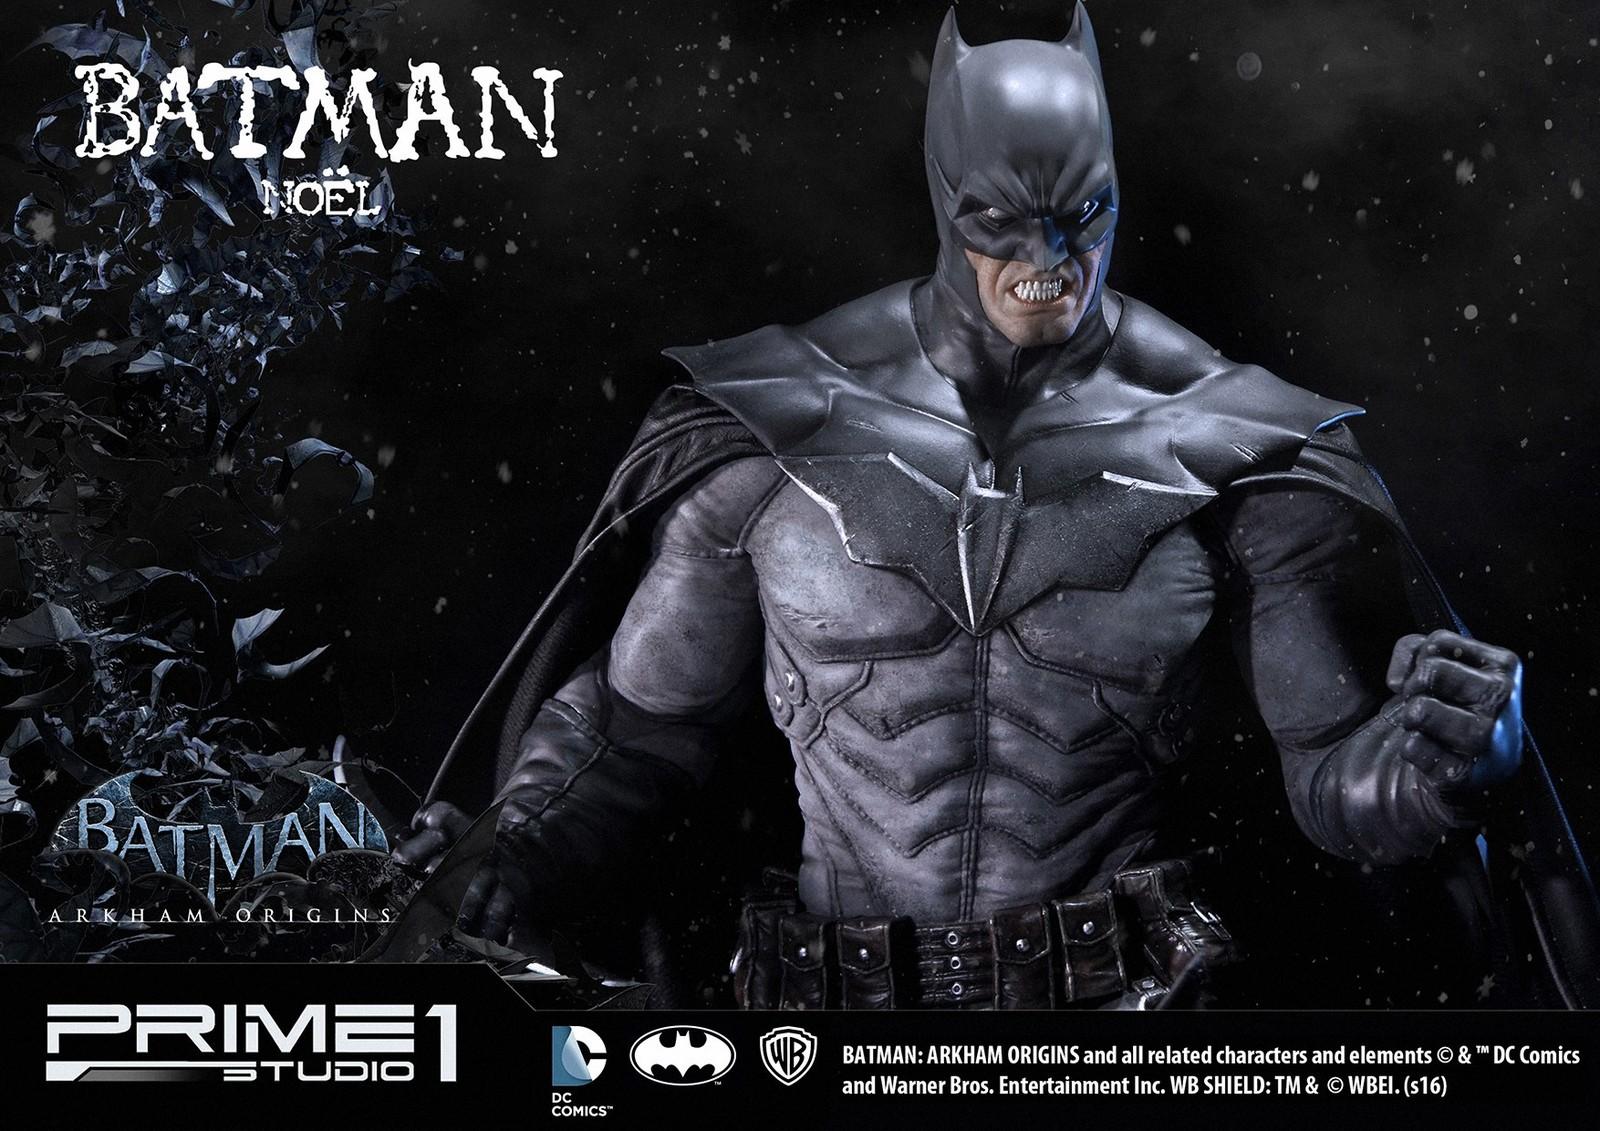 Noel Batman - Prime1